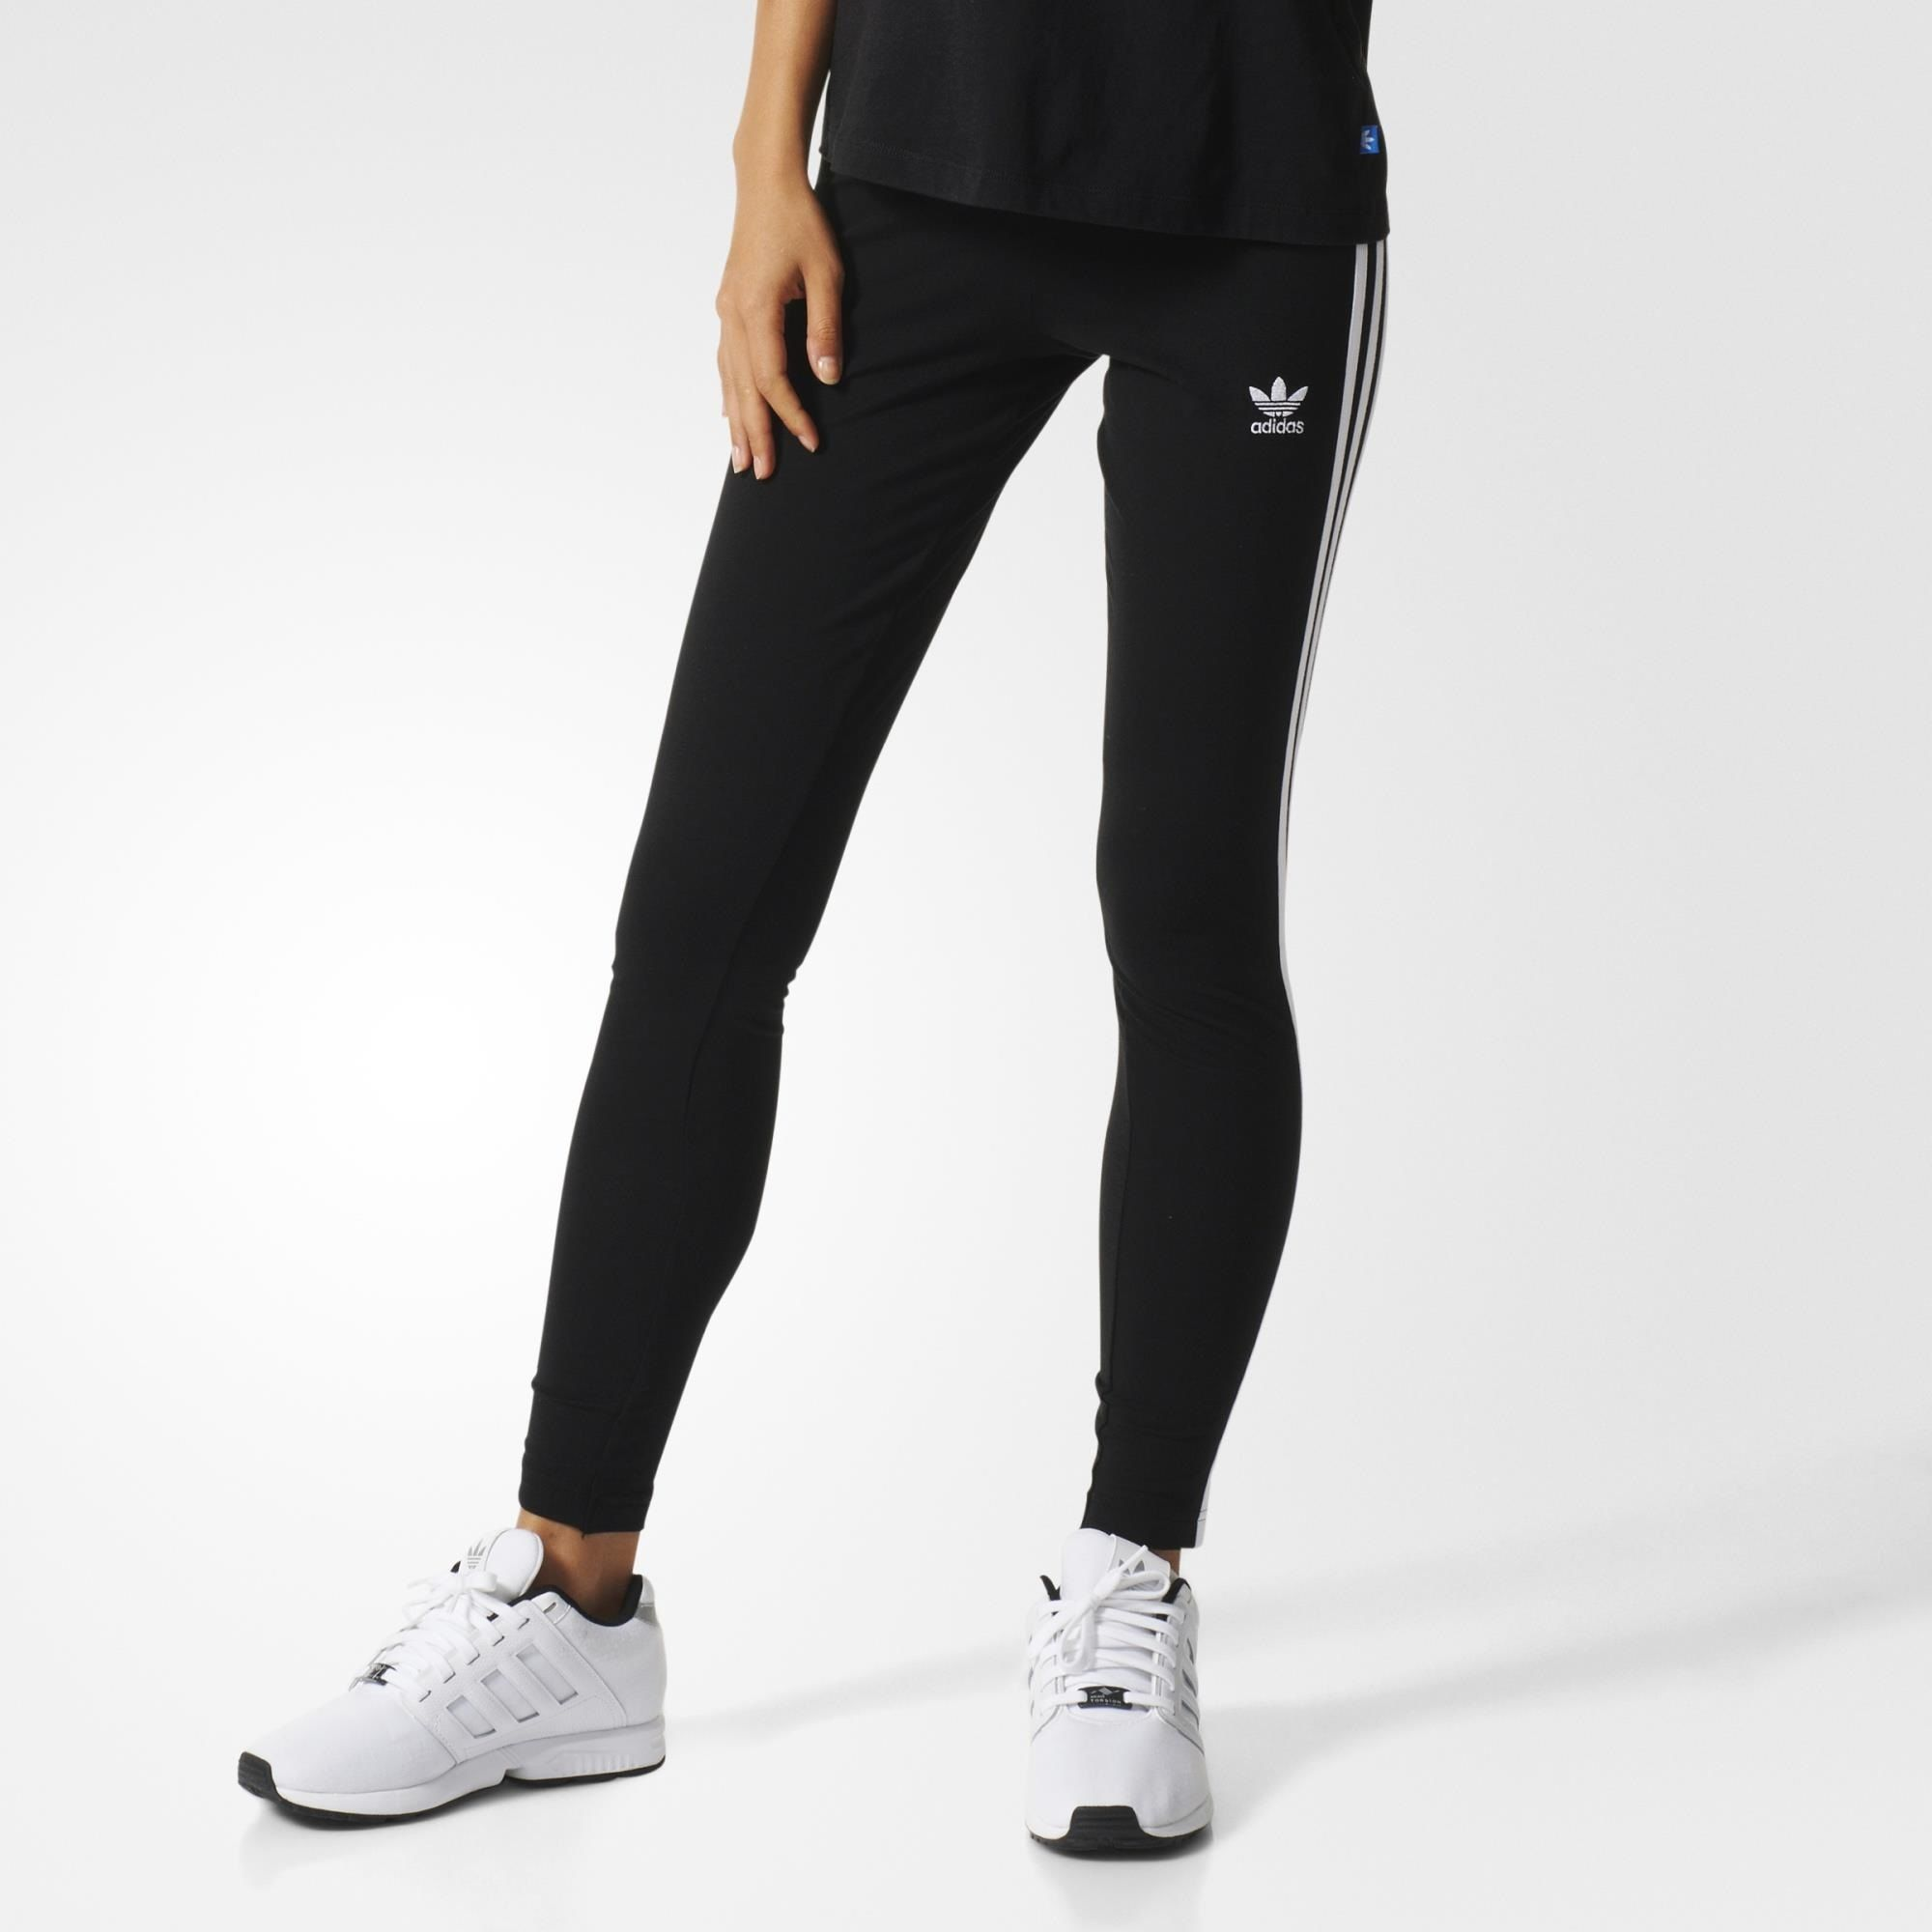 a3b37c85a90 Product details of Adidas Women's Originals 3-Stripes Leggings  AJ8156(CE2036) Black